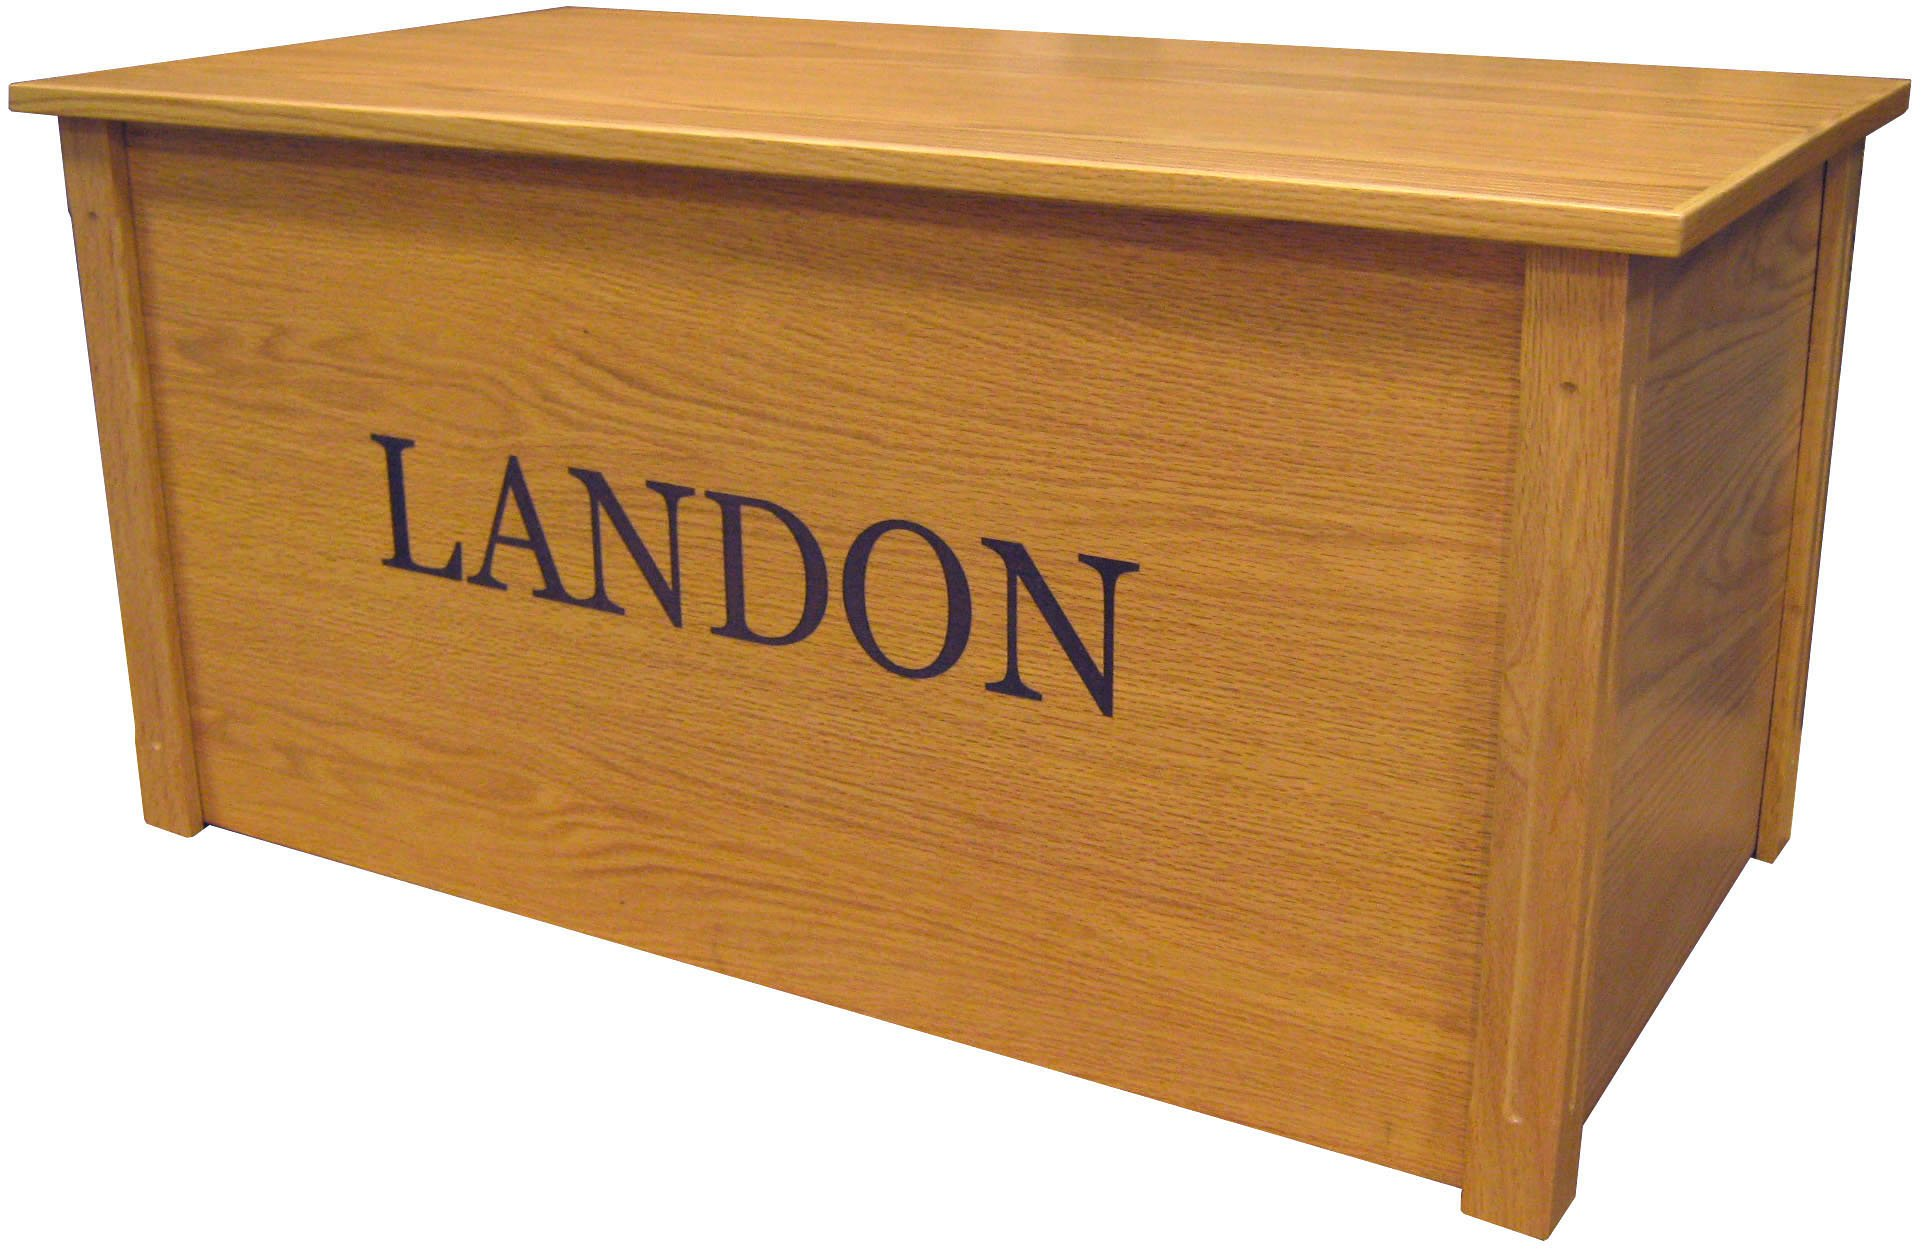 Wood Toy Box, Large Oak Toy Chest, Personalized Georgia Font, Custom Options (Cedar Base) by Wood Toy Box